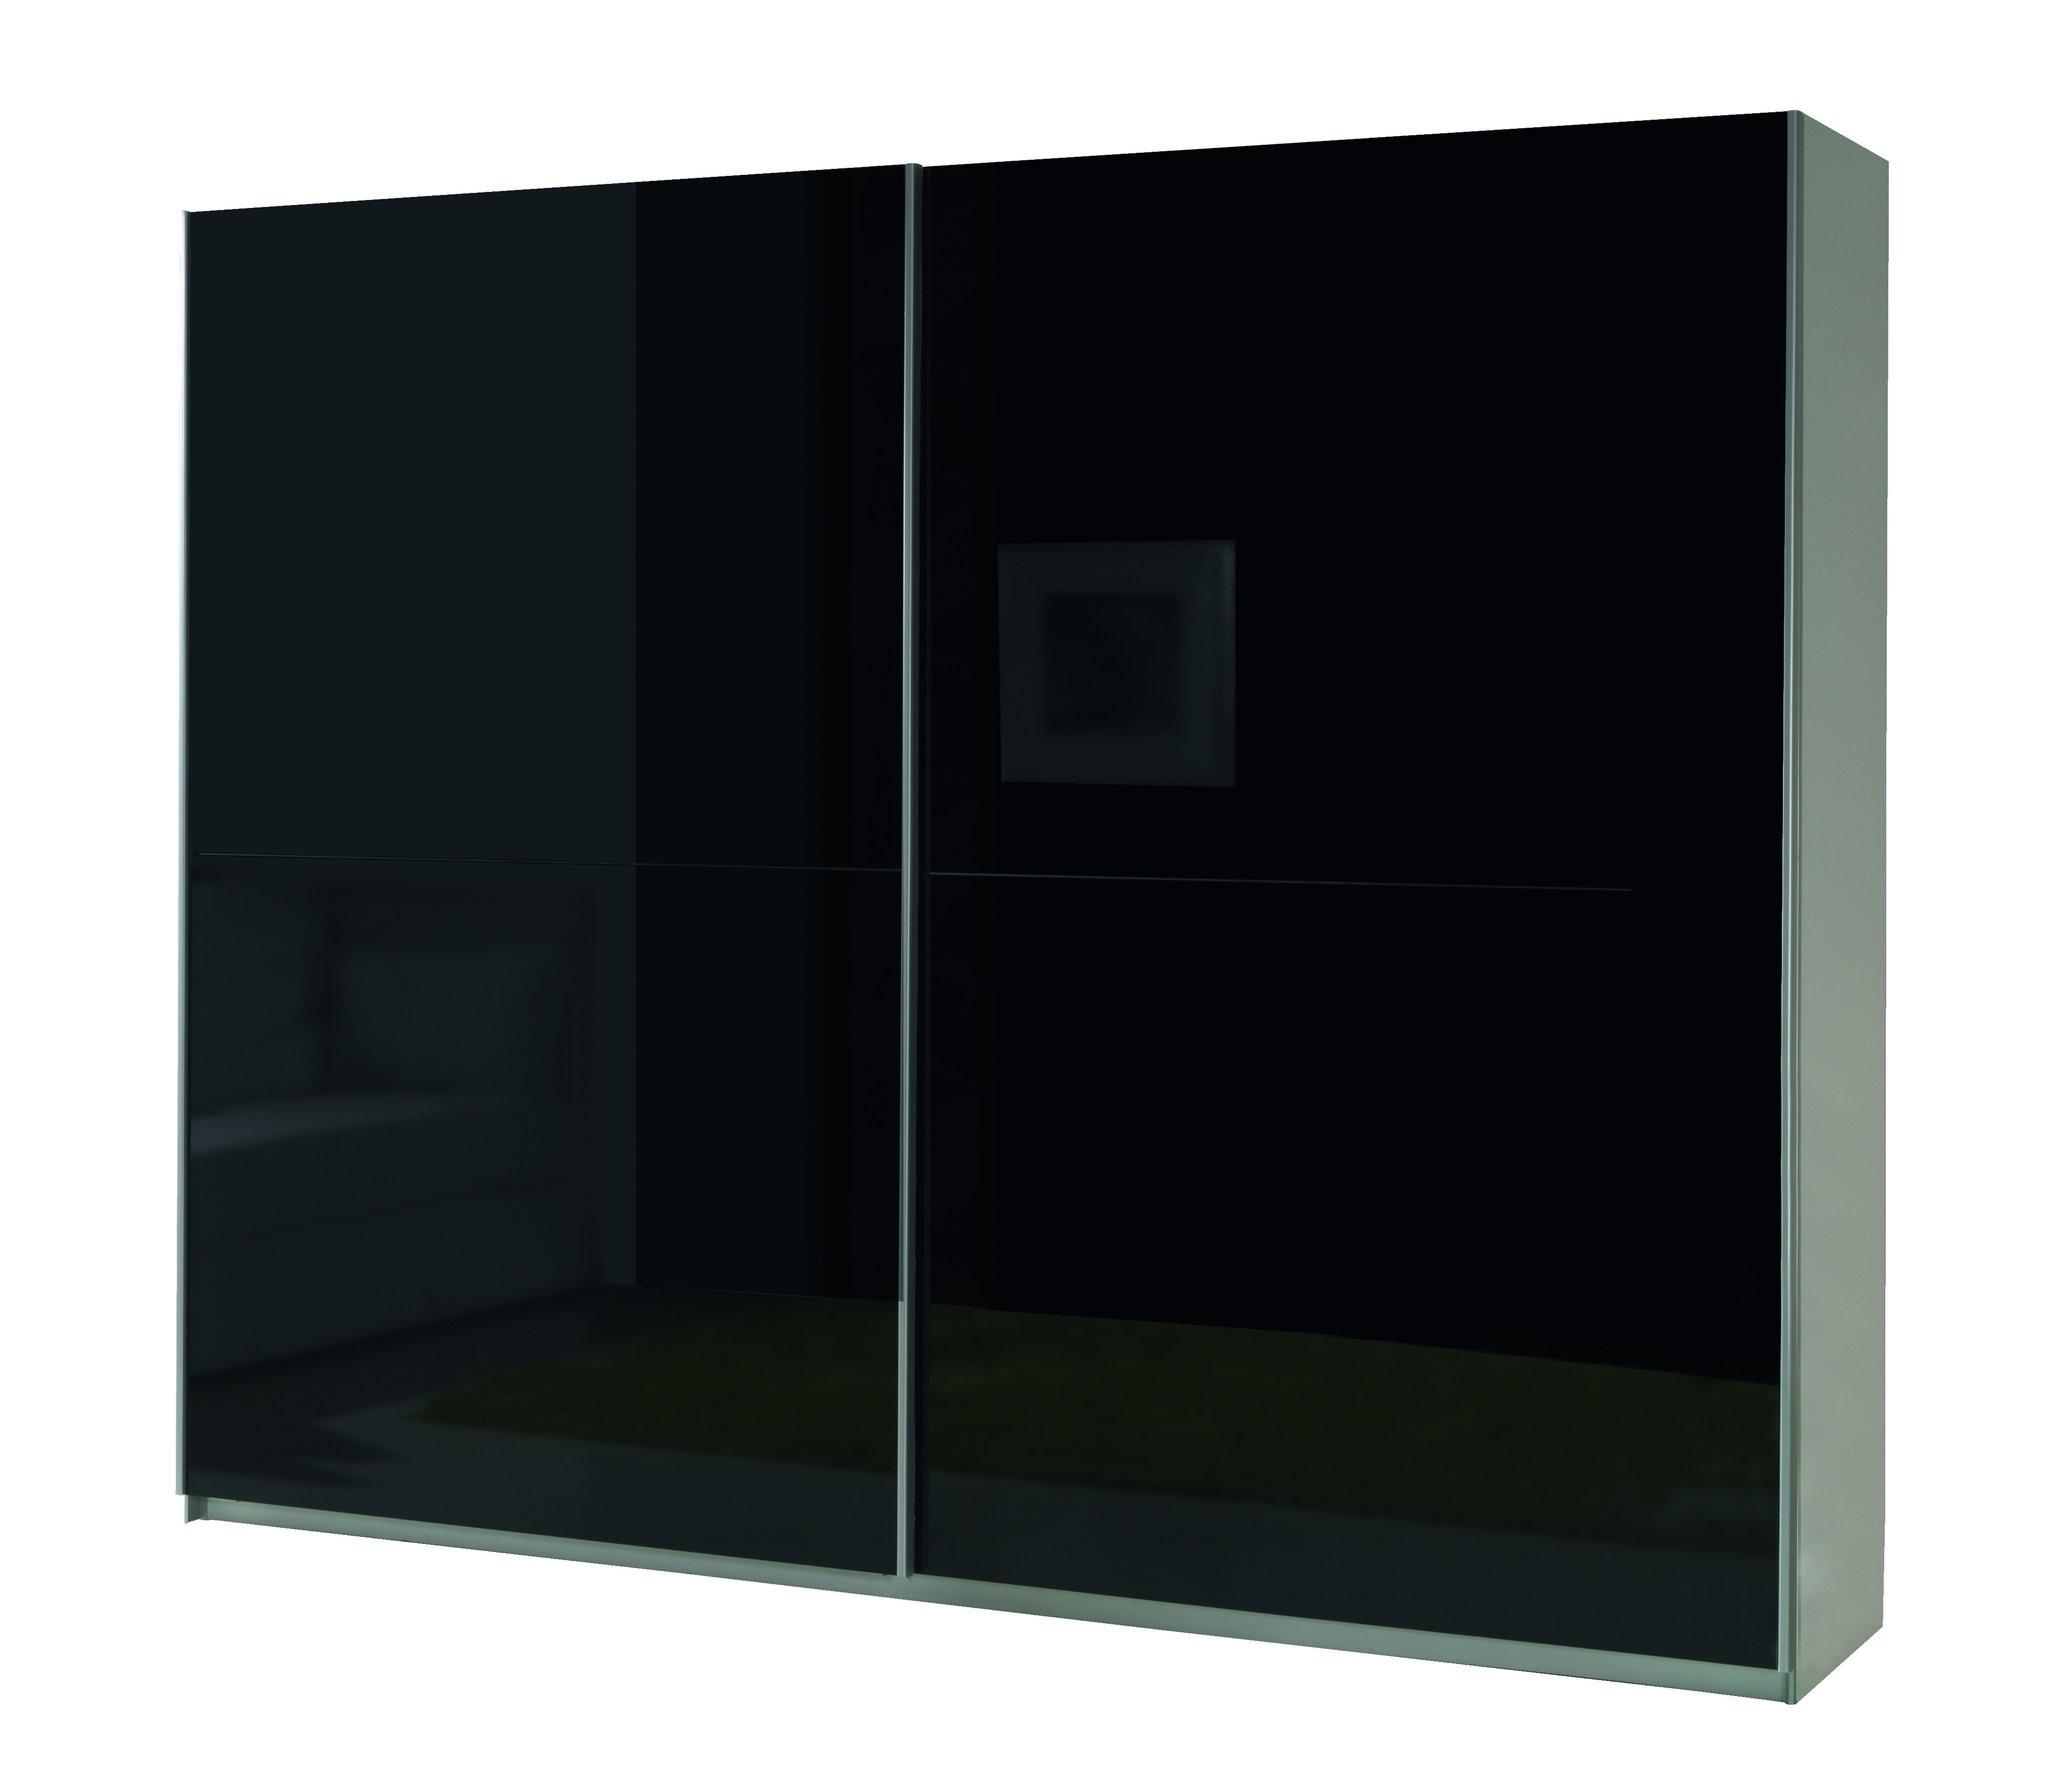 Sliding Wardrobe – Cheap Home Furniture Regarding 2018 Black Shiny Wardrobes (View 10 of 15)